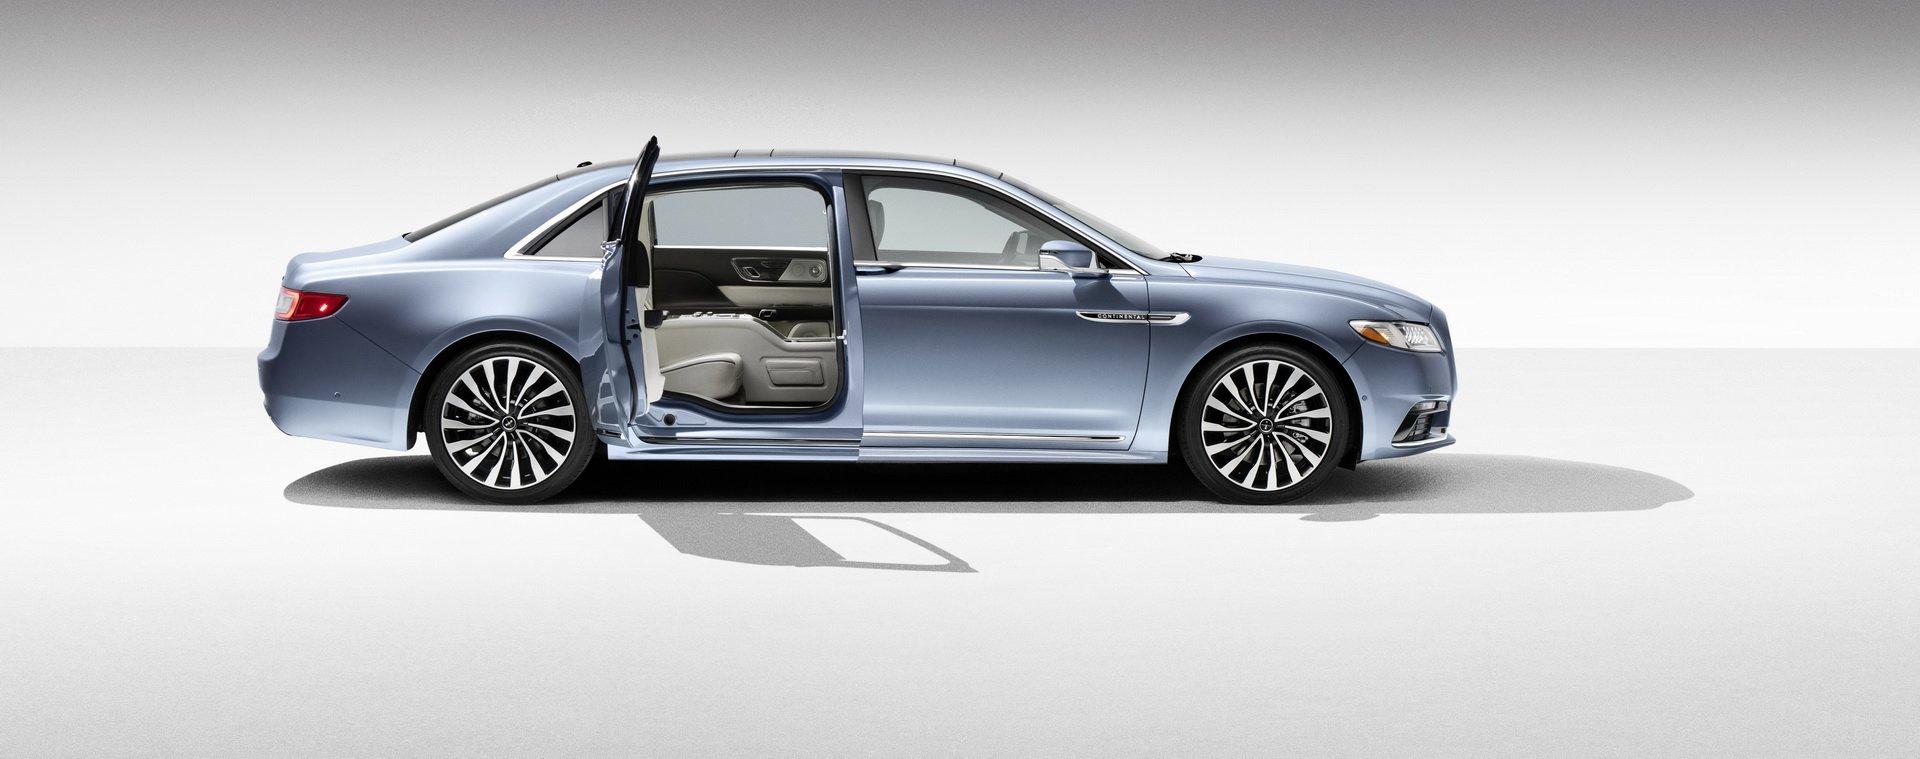 Lincoln Continental Coach Door Edition (44)